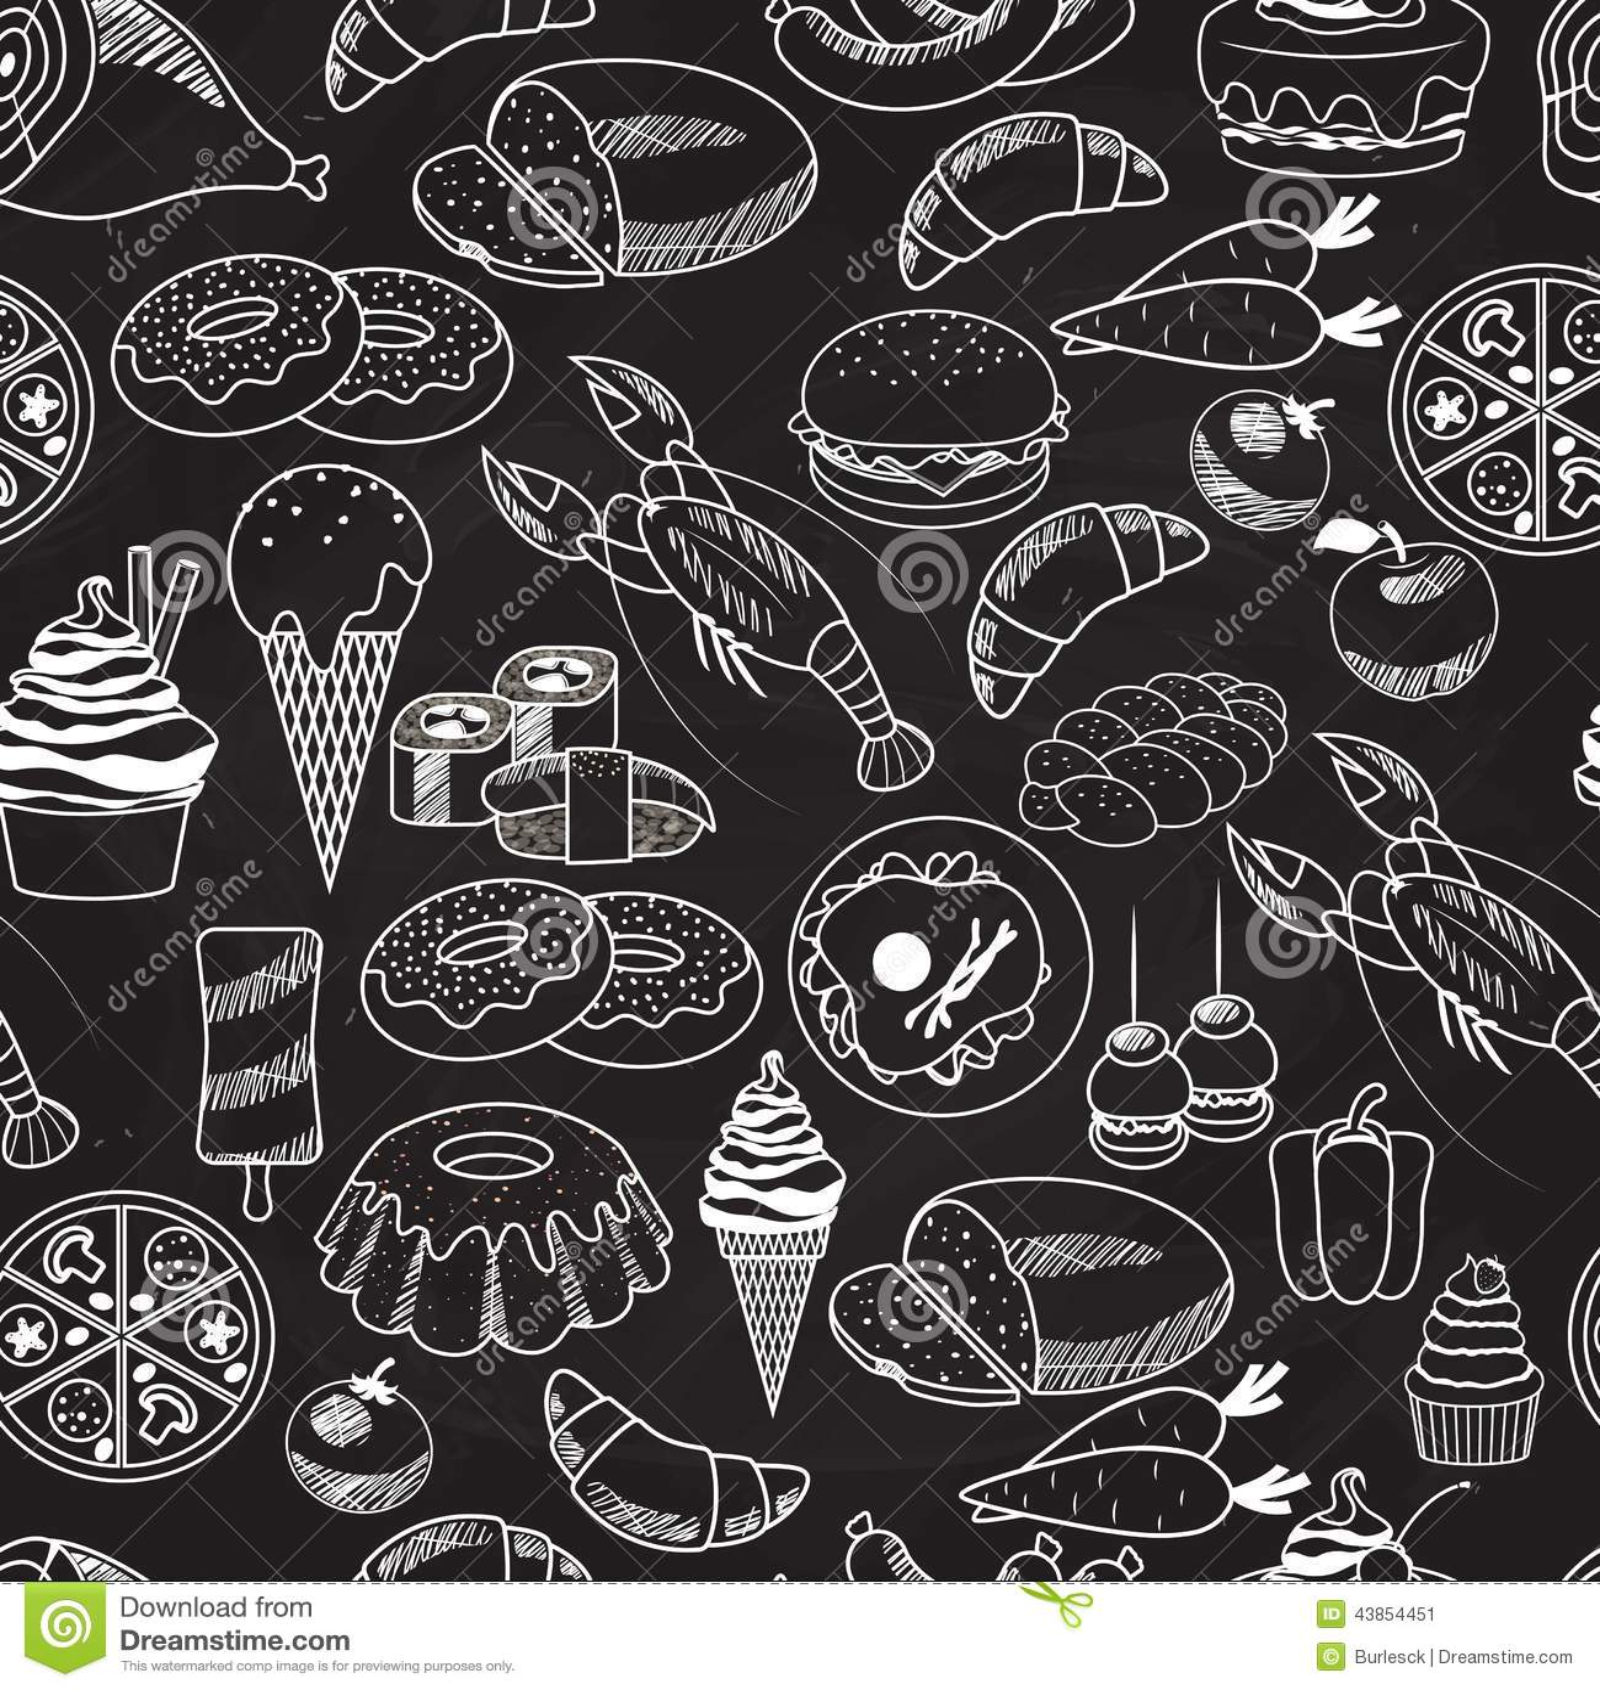 Home Design Ideas Blackboard: Vector Seamless Food On Chalkboard Background Stock Photo